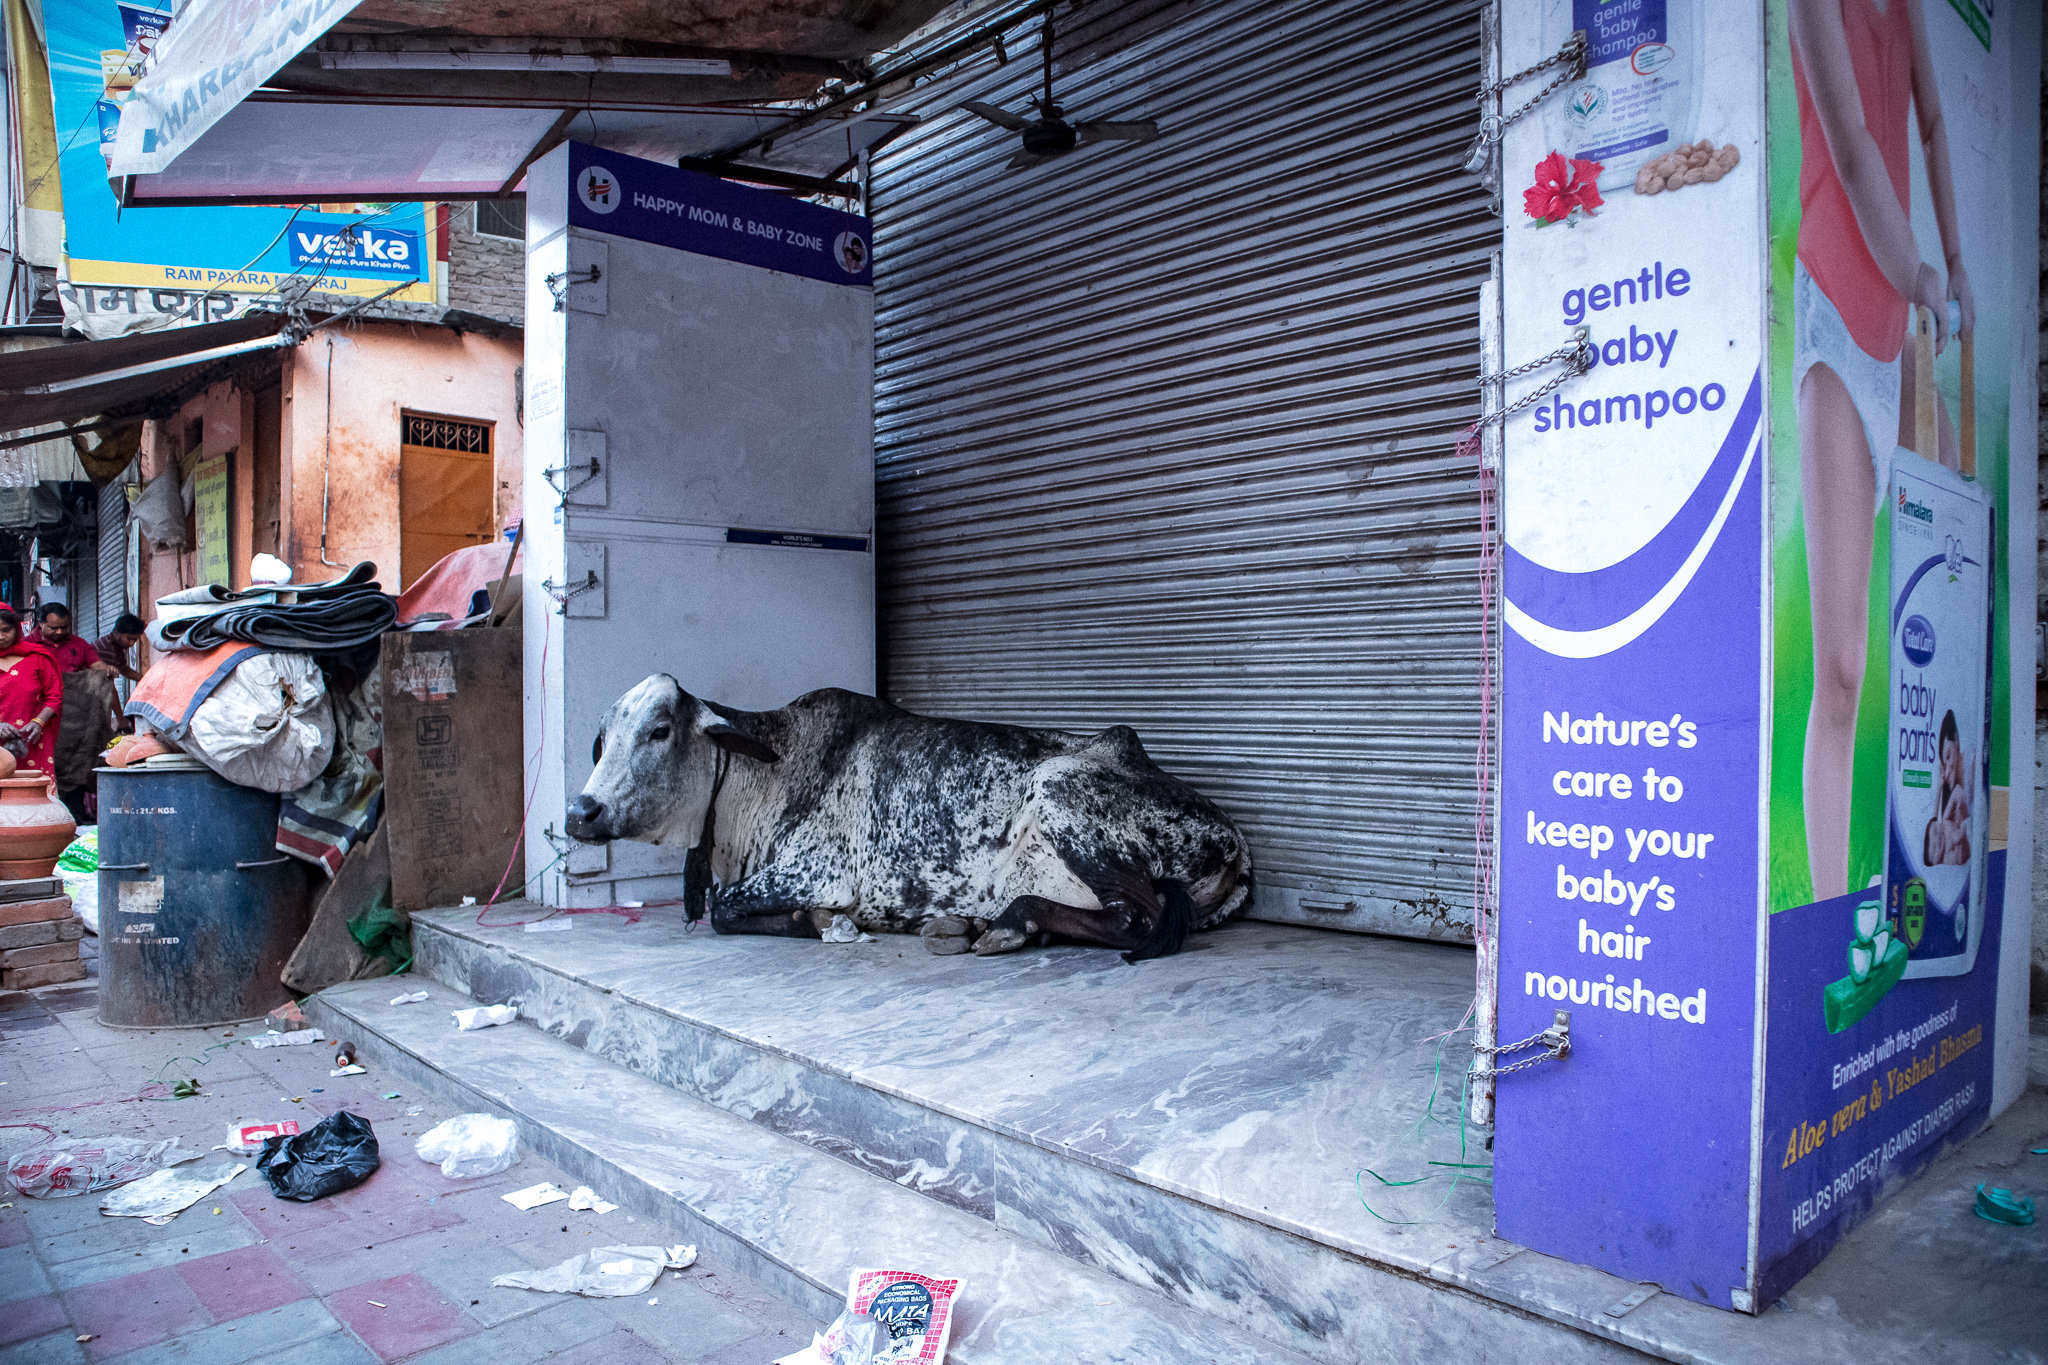 24_crazy_hours_india.jpg